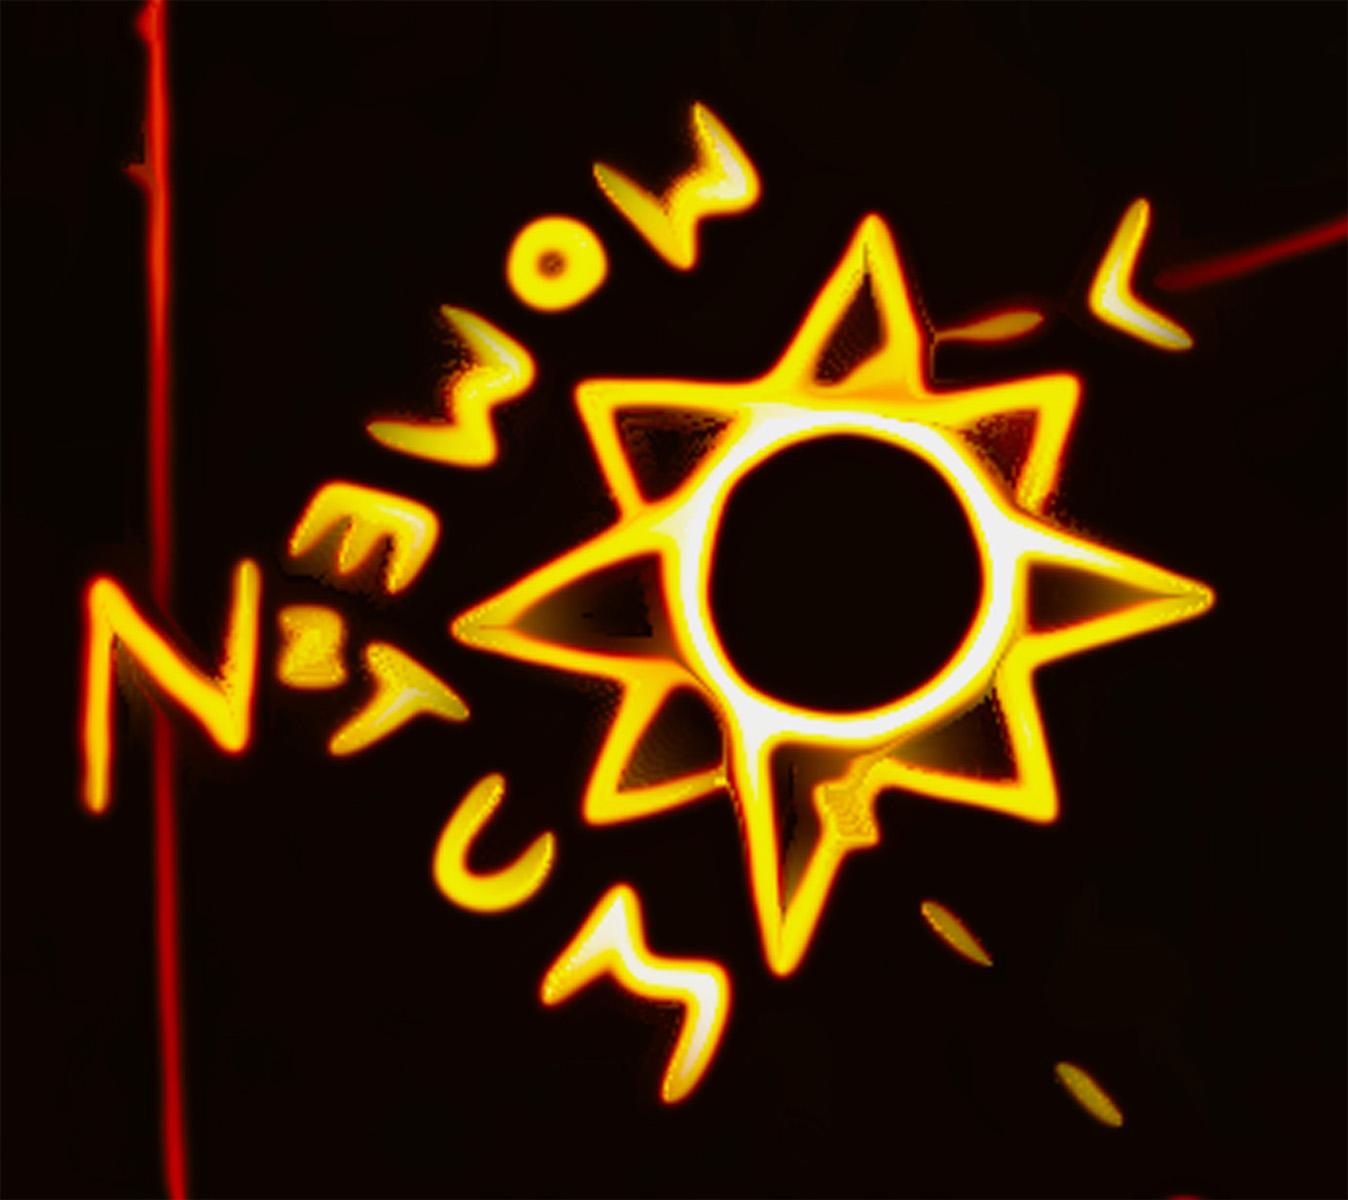 neotaoart's Signature